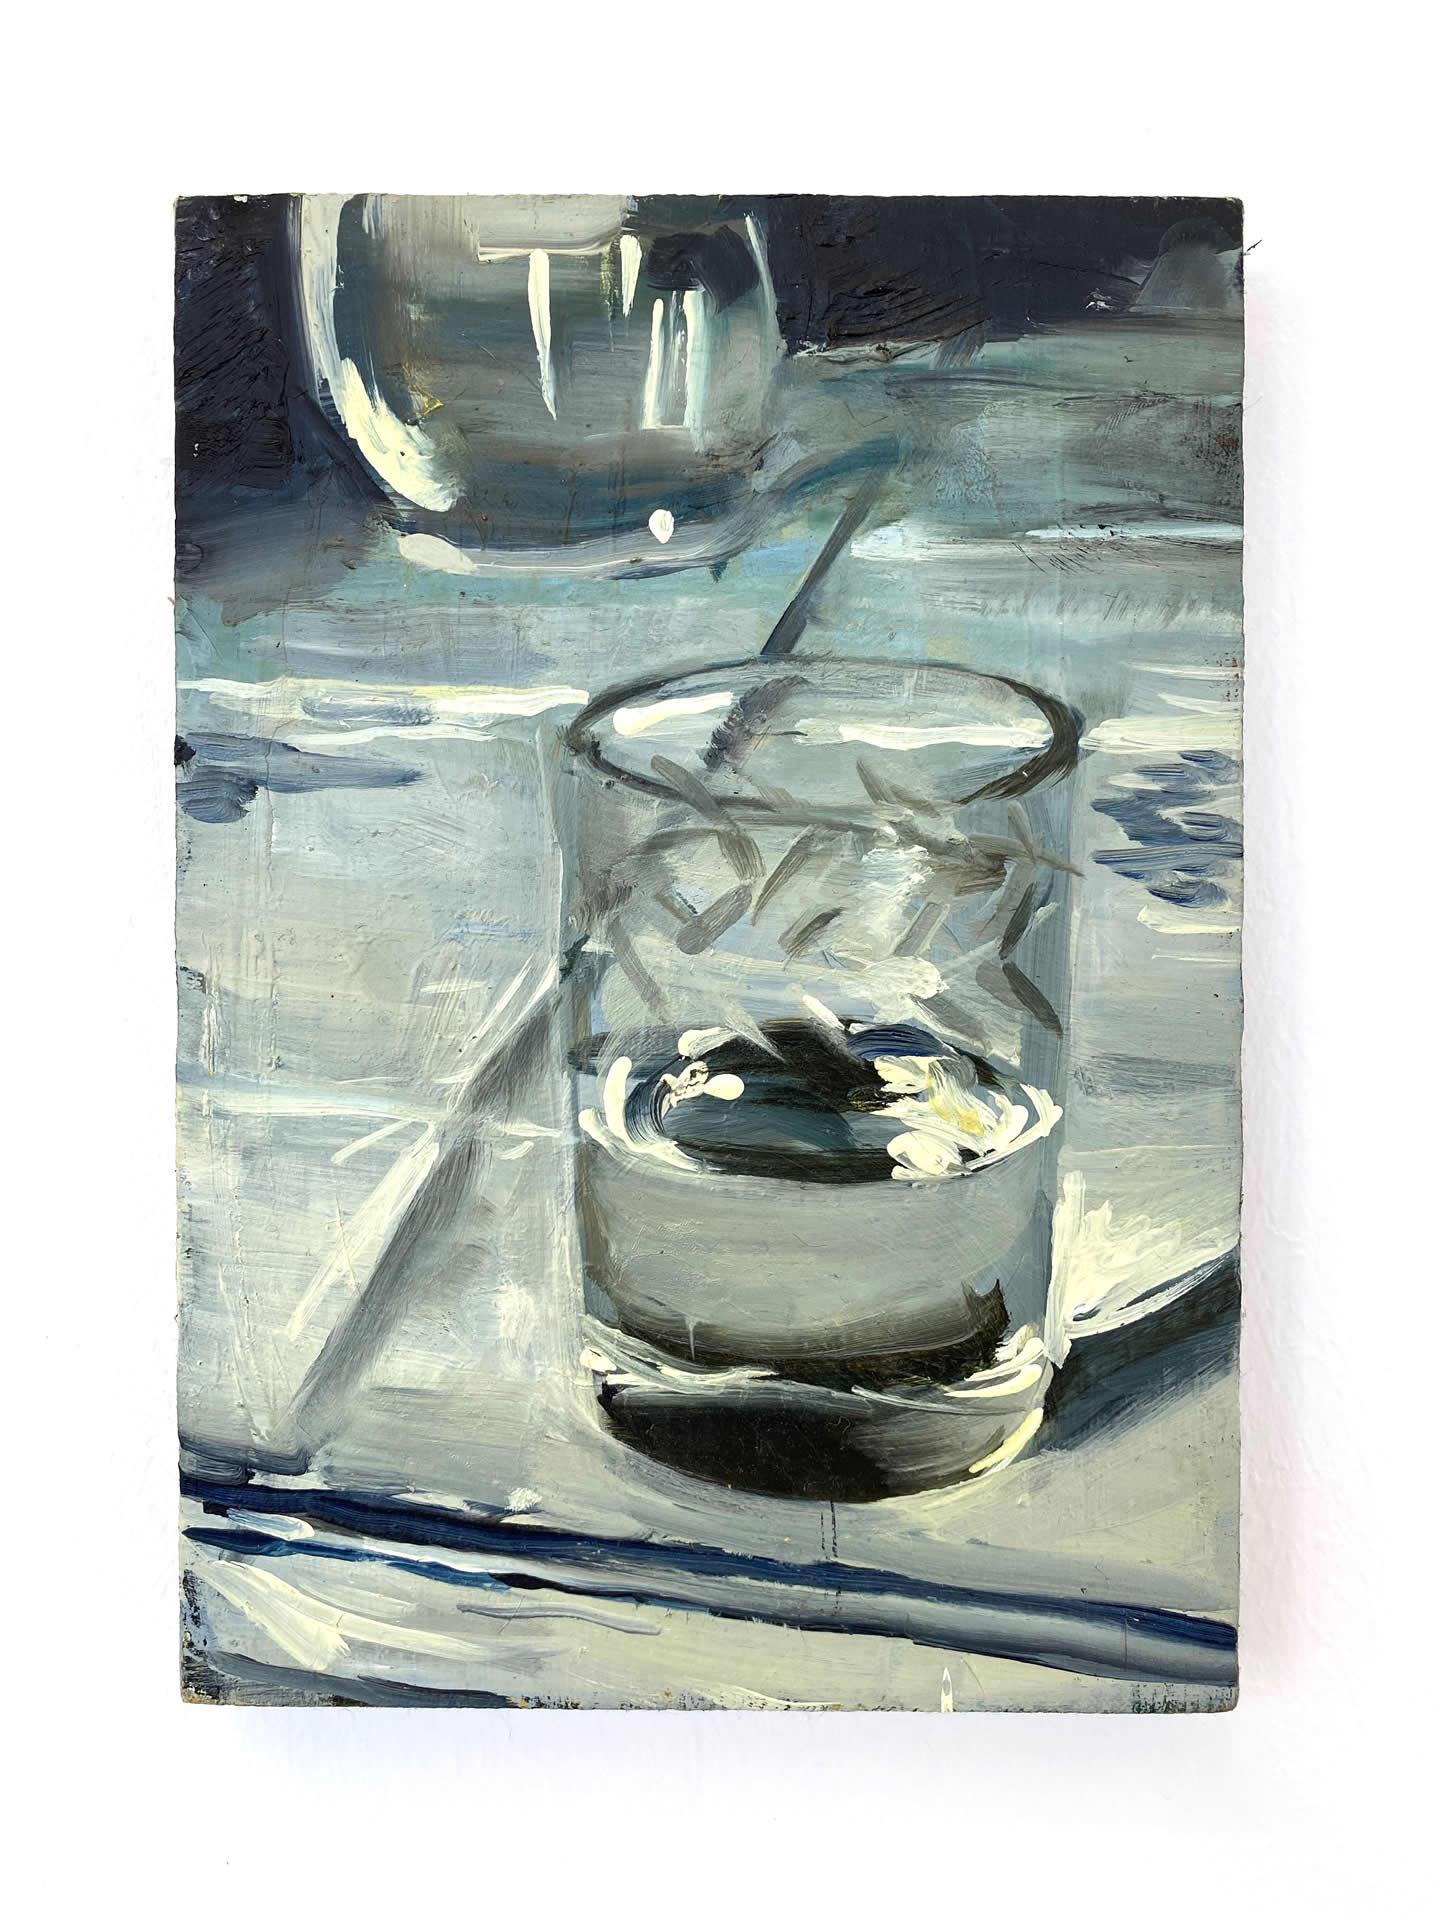 Alex Amann | O.T. | 2017 | Öl auf Leinwand | 27x19cm | plaisirs simples | Galerie3